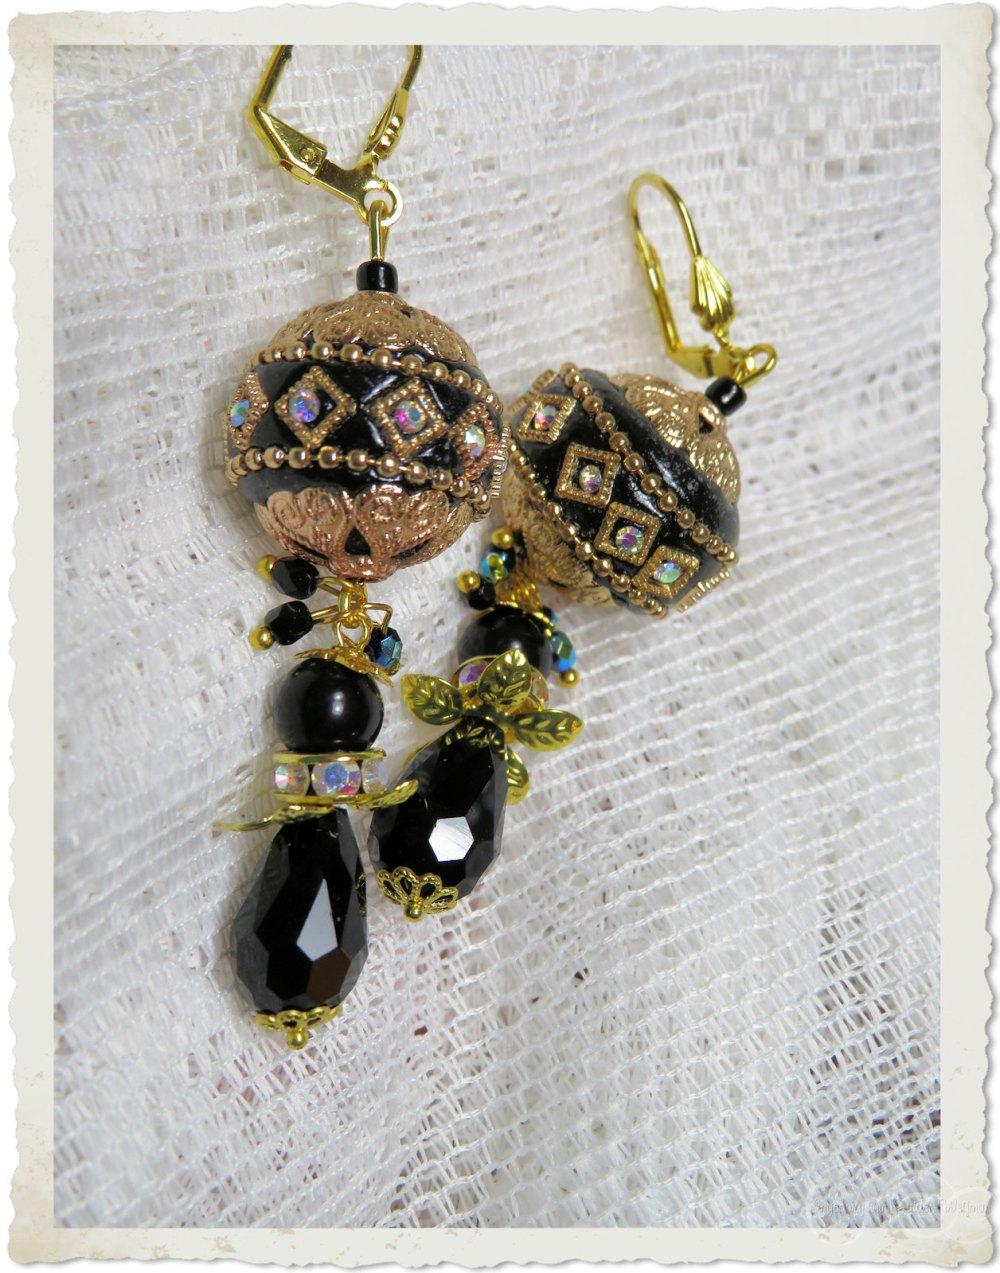 Handmade black gold earrings with strass by Ingeborg van Zuiden